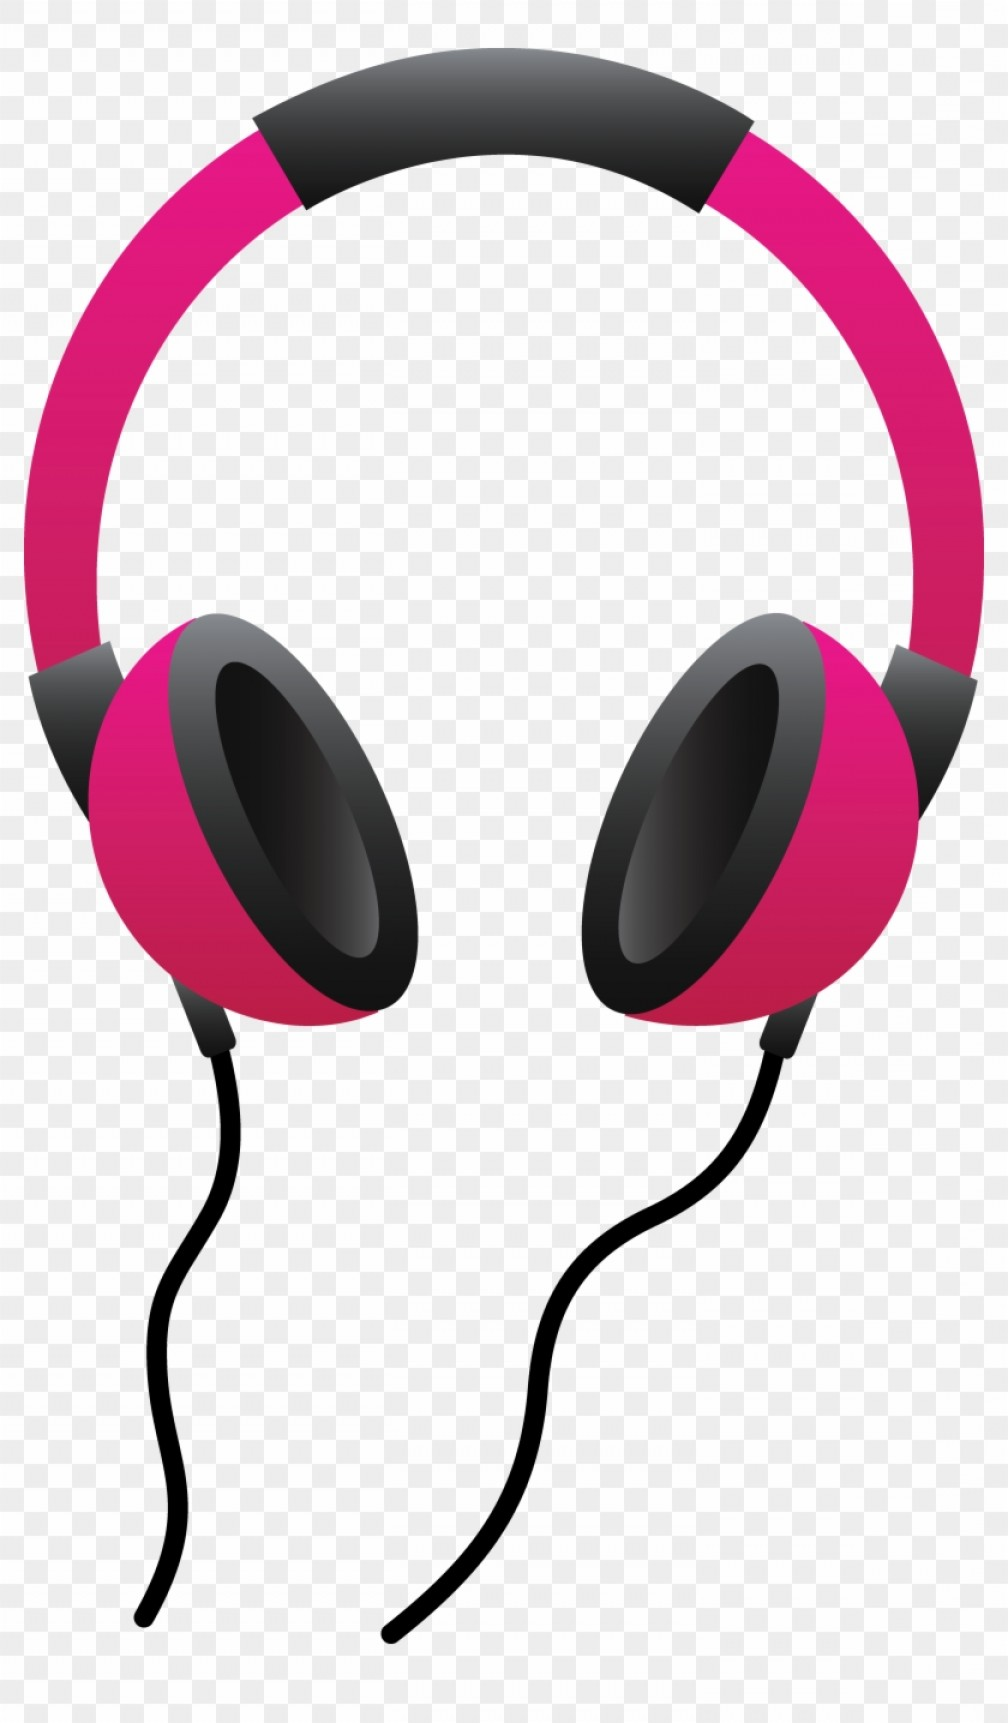 Miizikiaipod clip art pink. Headphones clipart jpeg